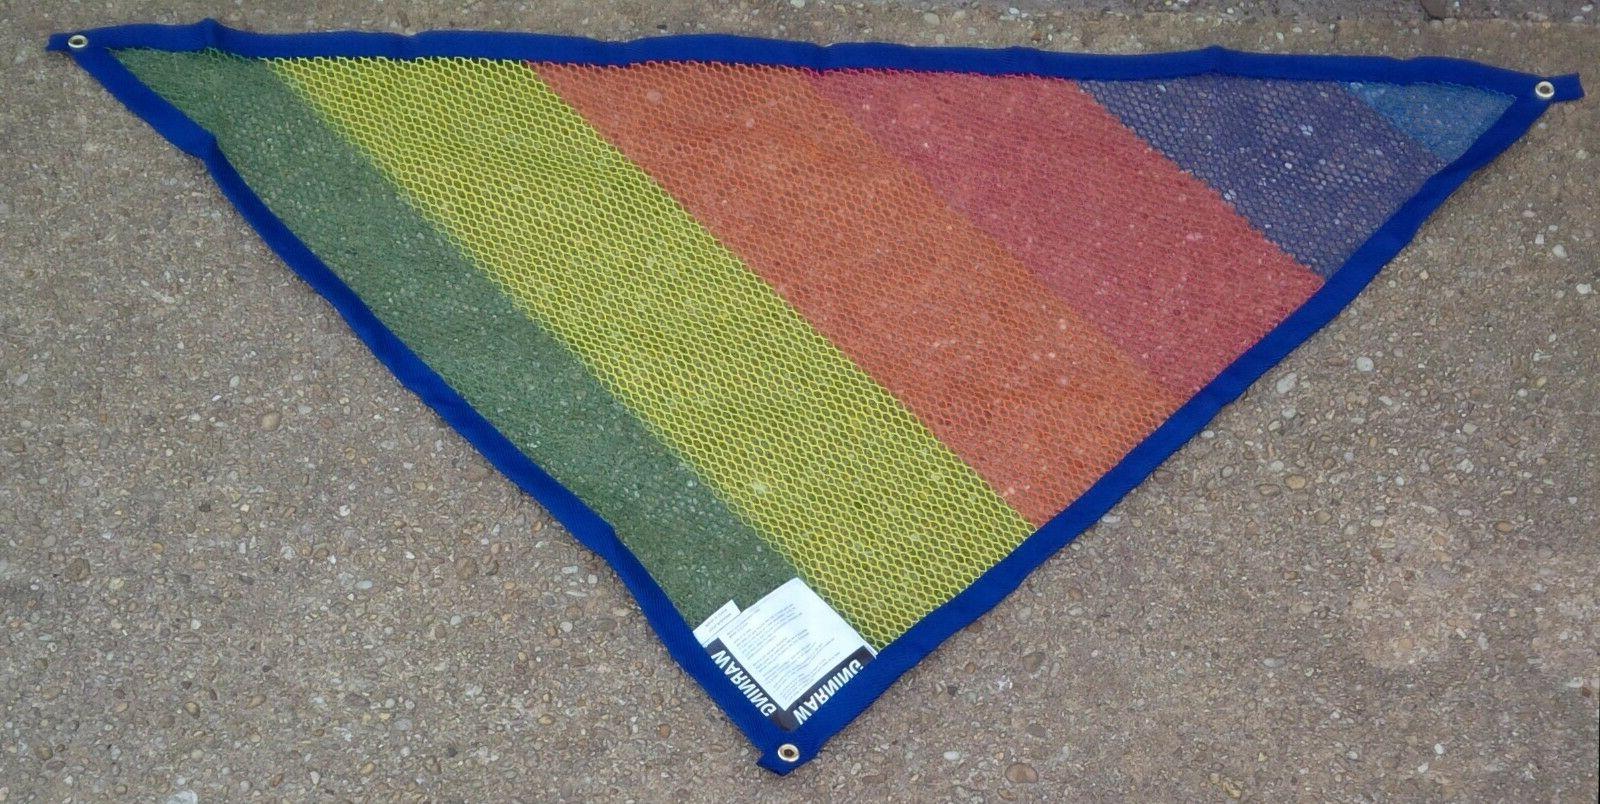 Deluxe Rainbow - Toy - Hammock blue